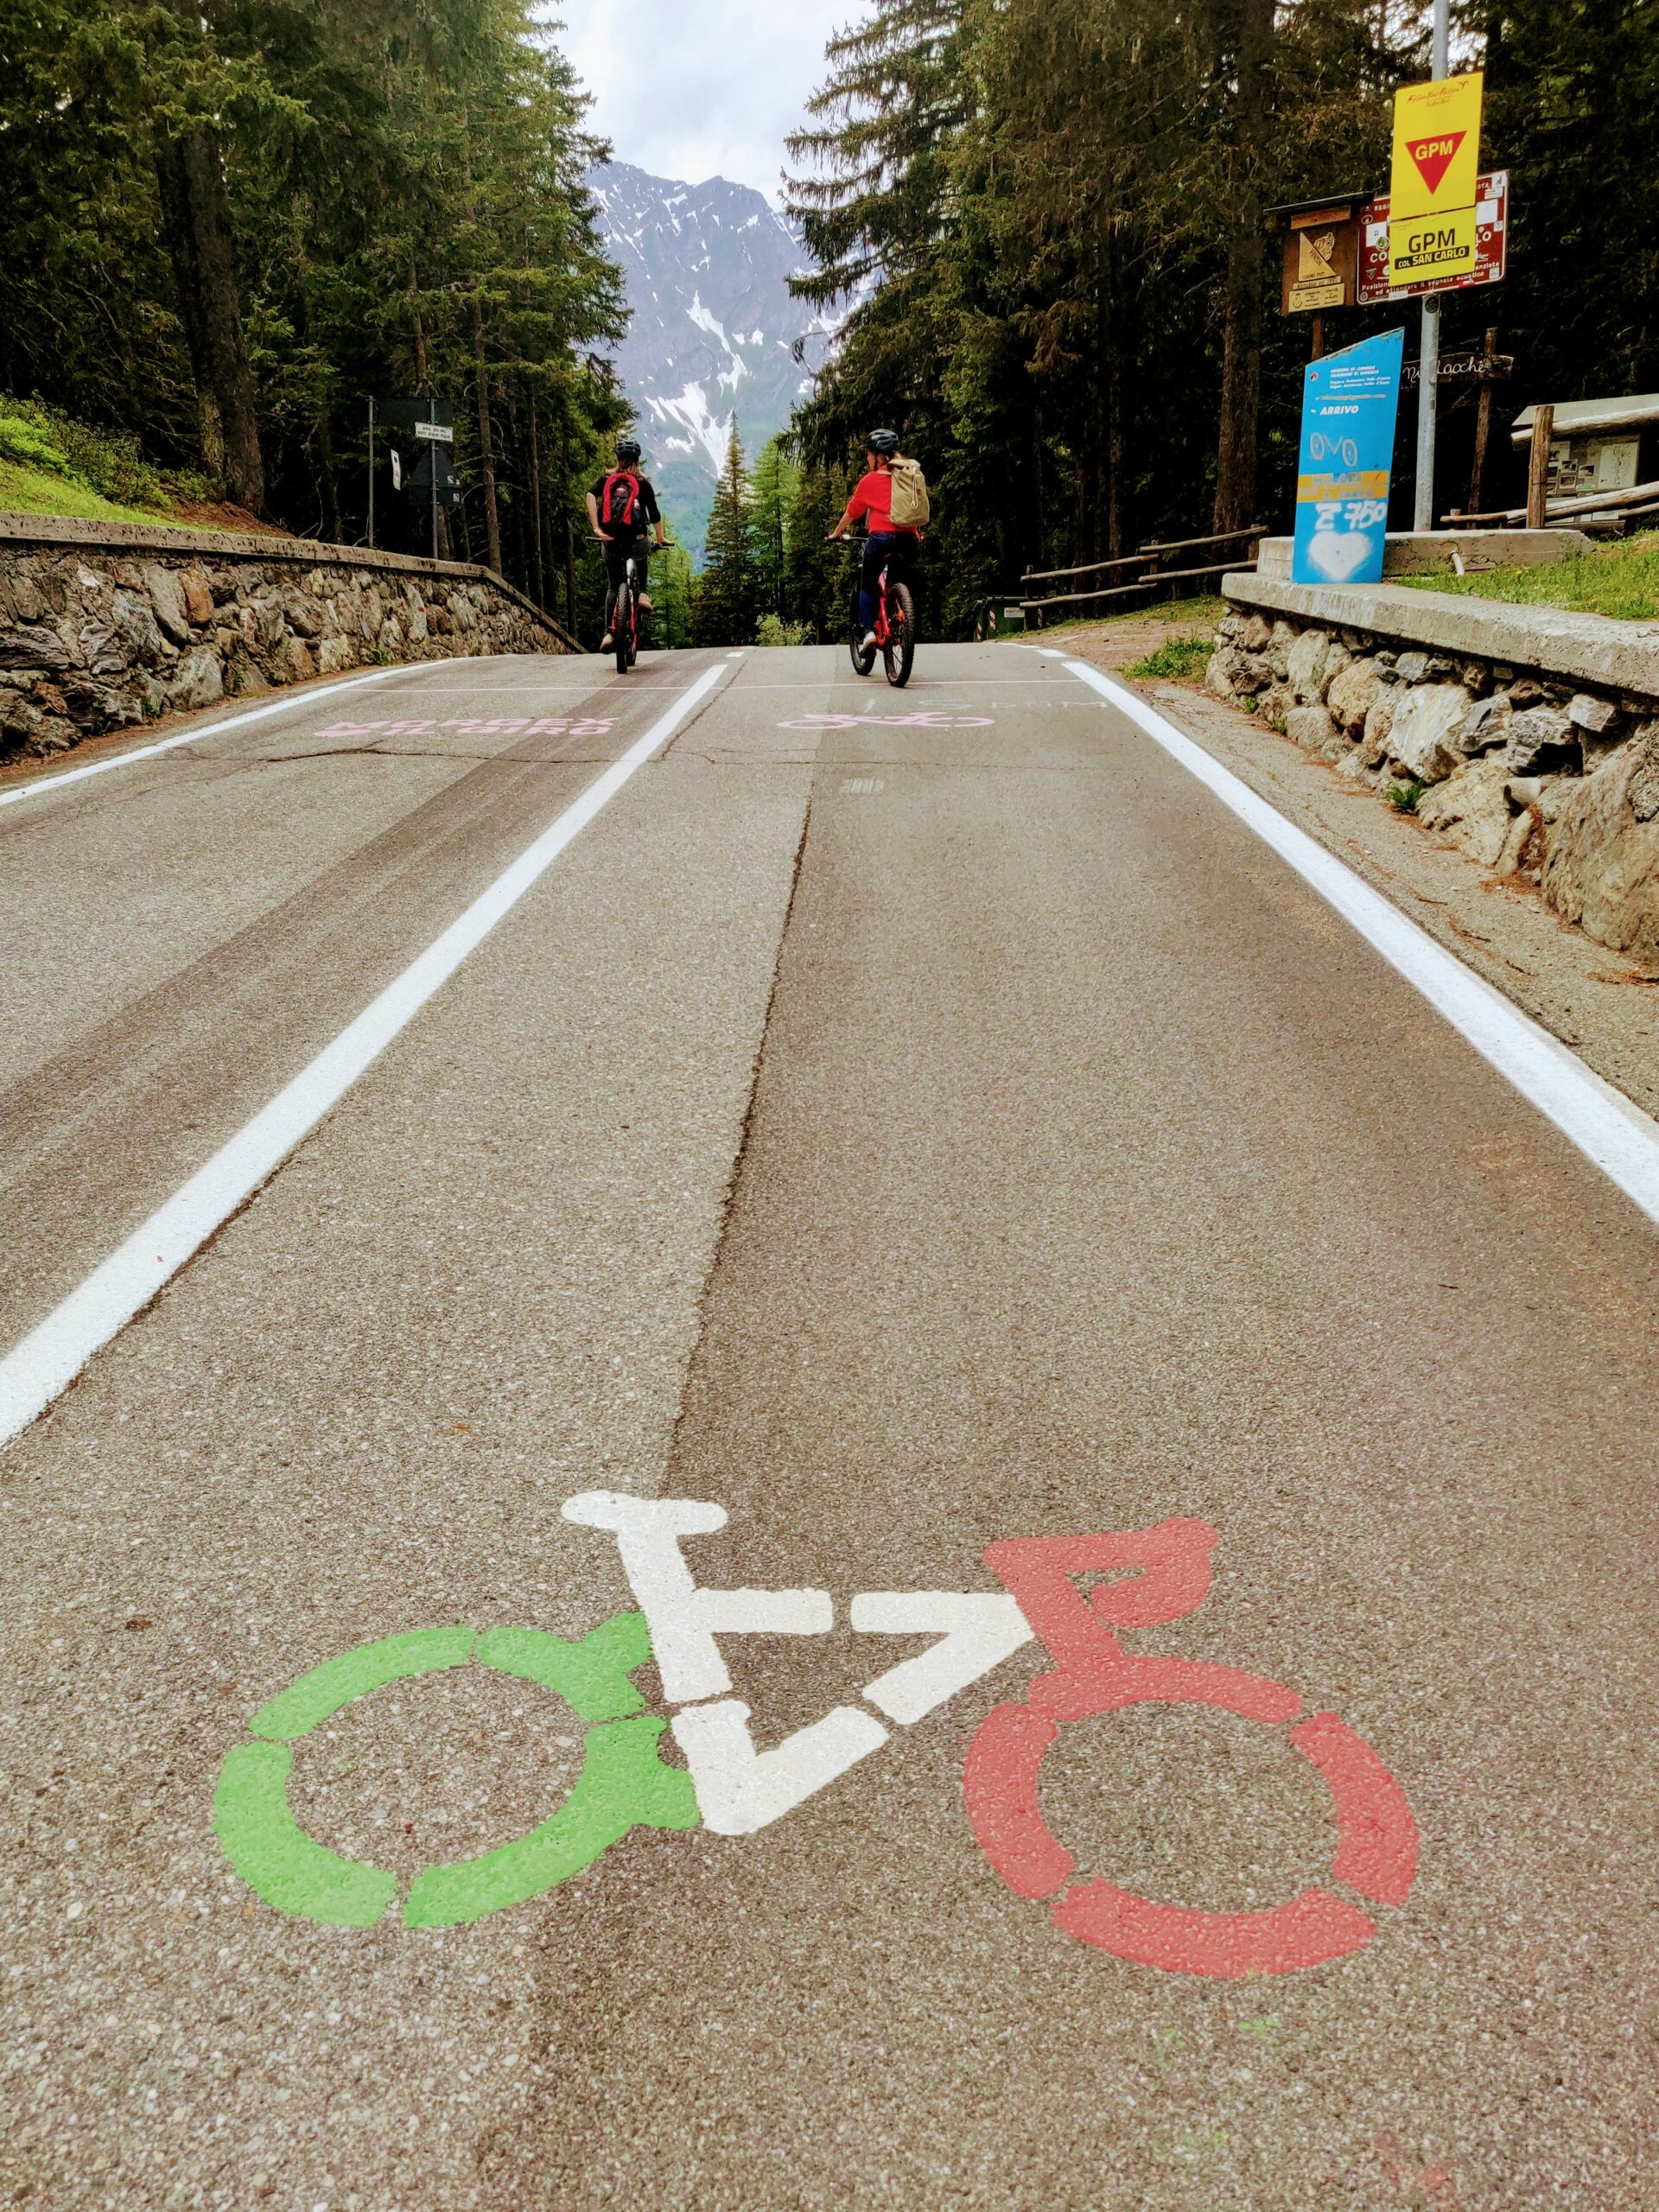 Val D'Aosta - Giro - Fiets bestemming - TravelRebel